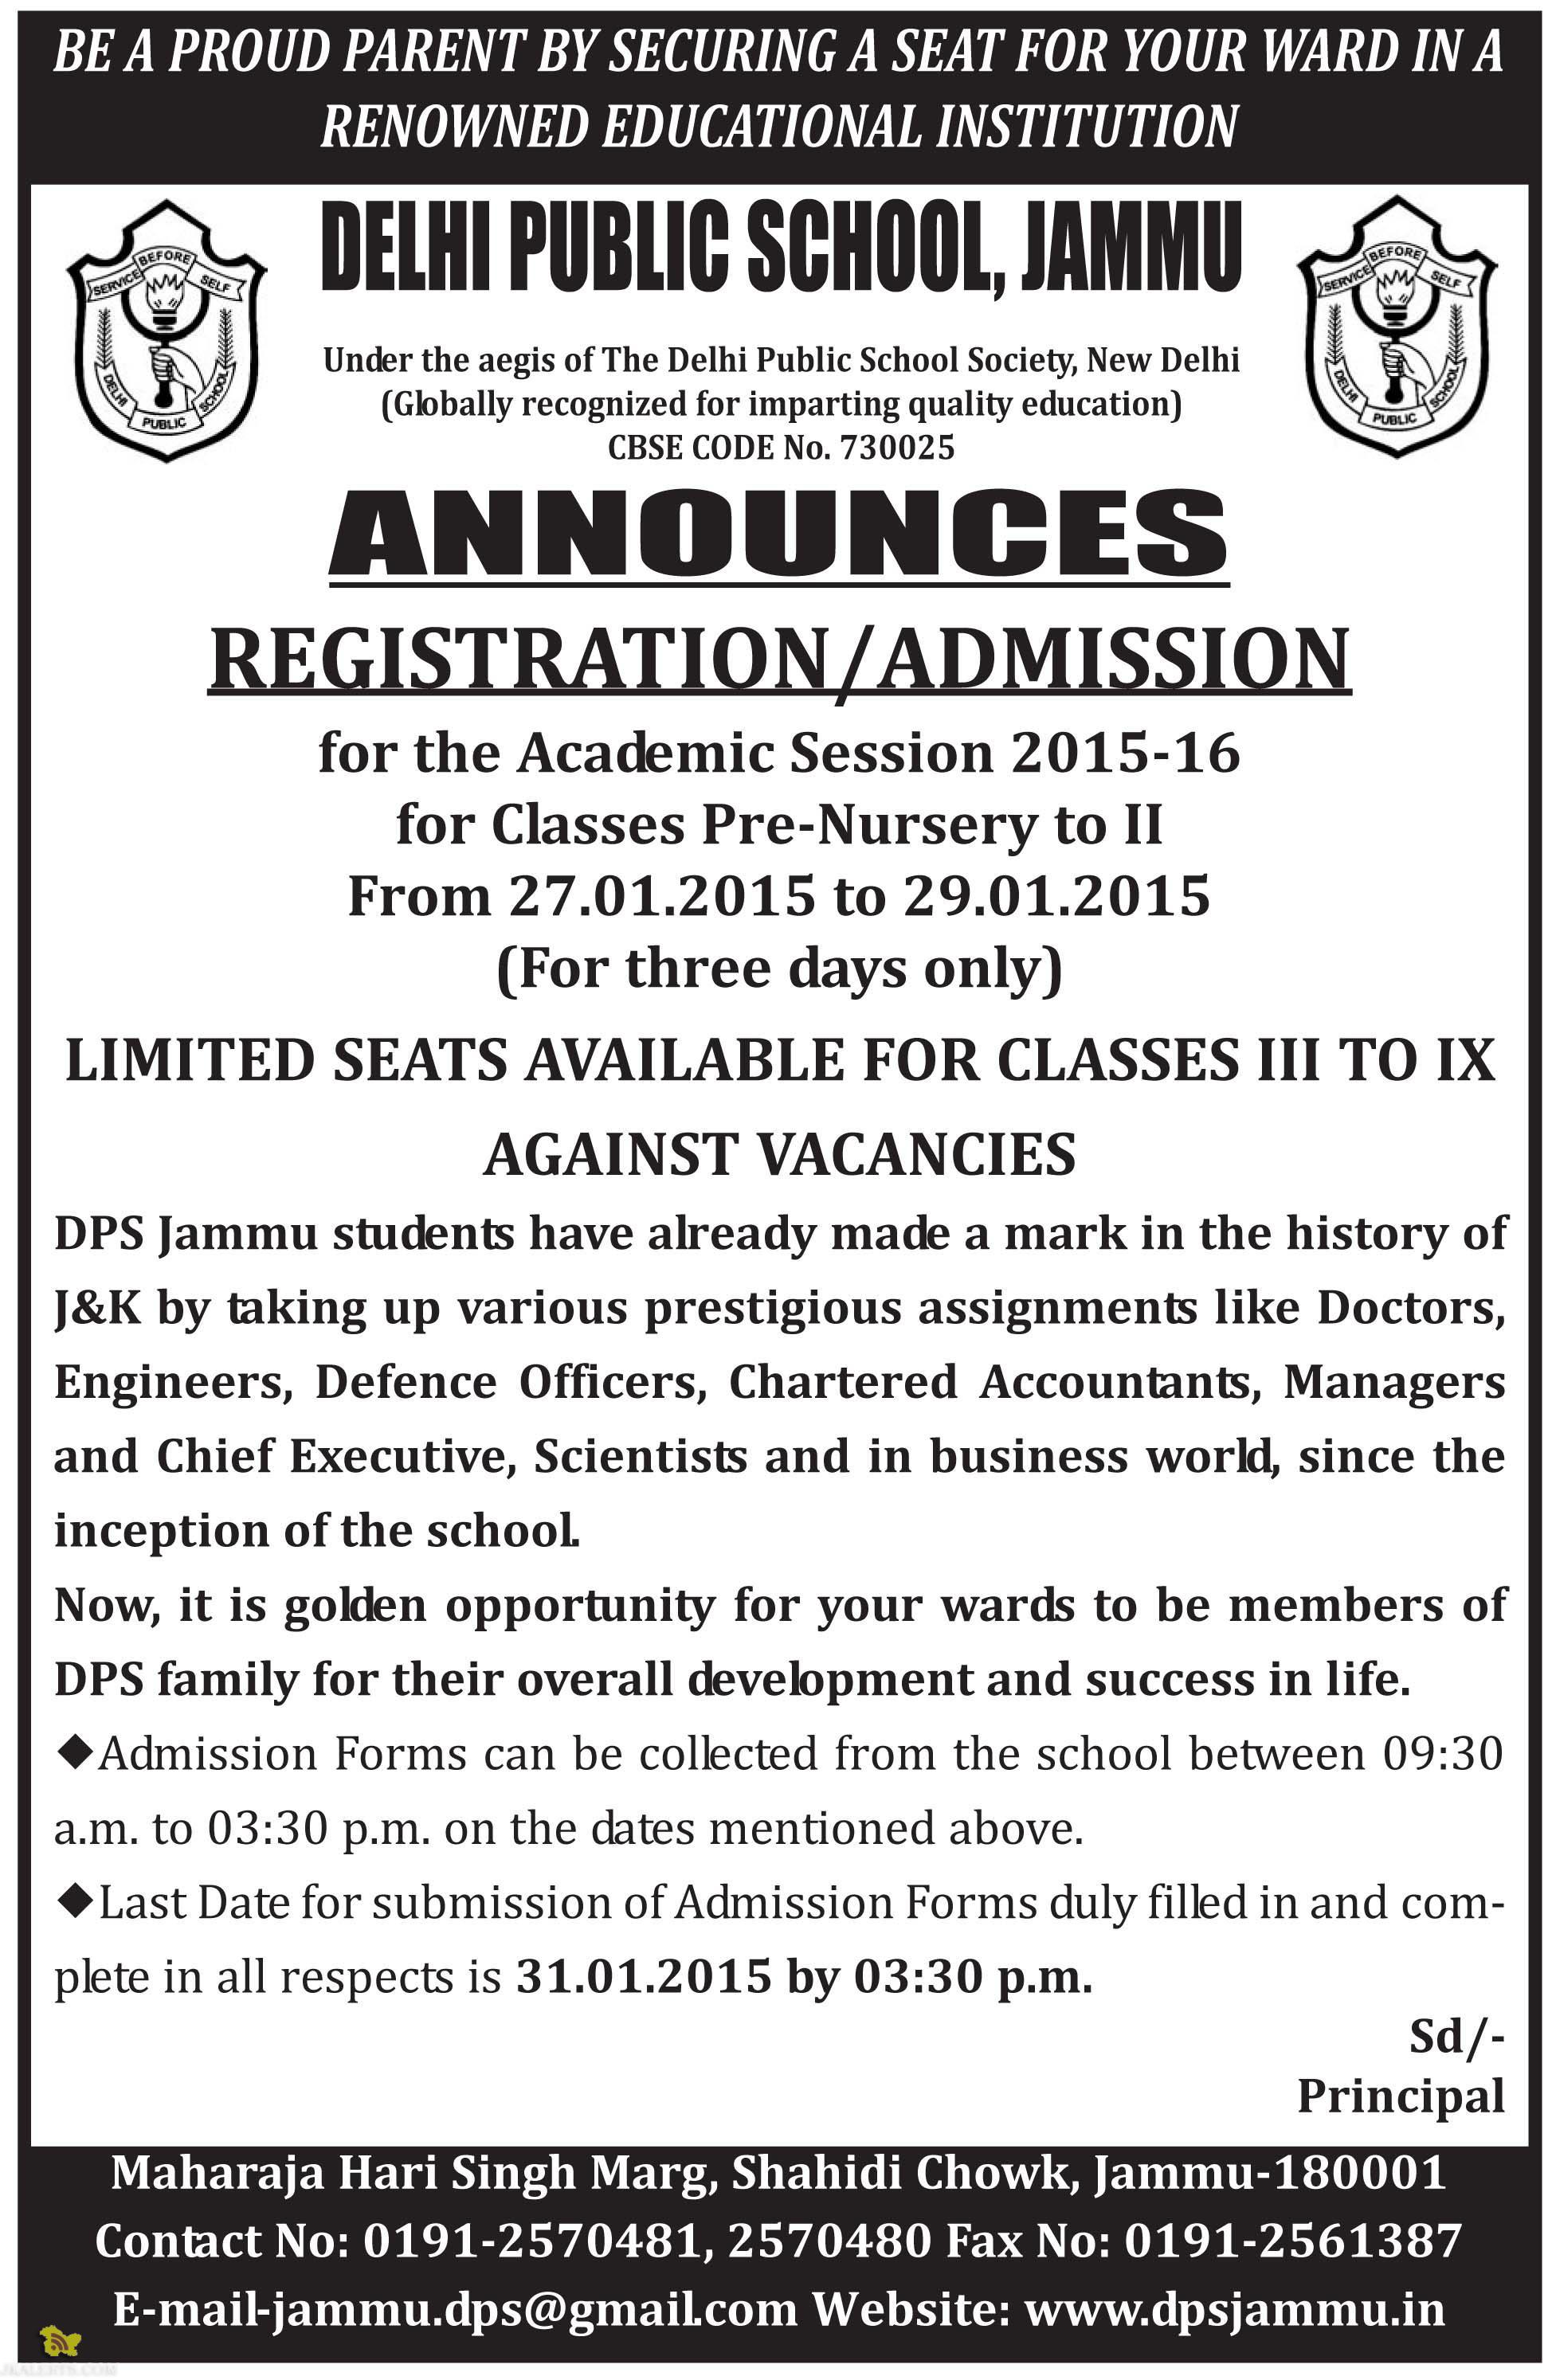 DELHI PUBLIC SCHOOL JAMMU REGISTRATION / ADMISSION SESSION 2015-16